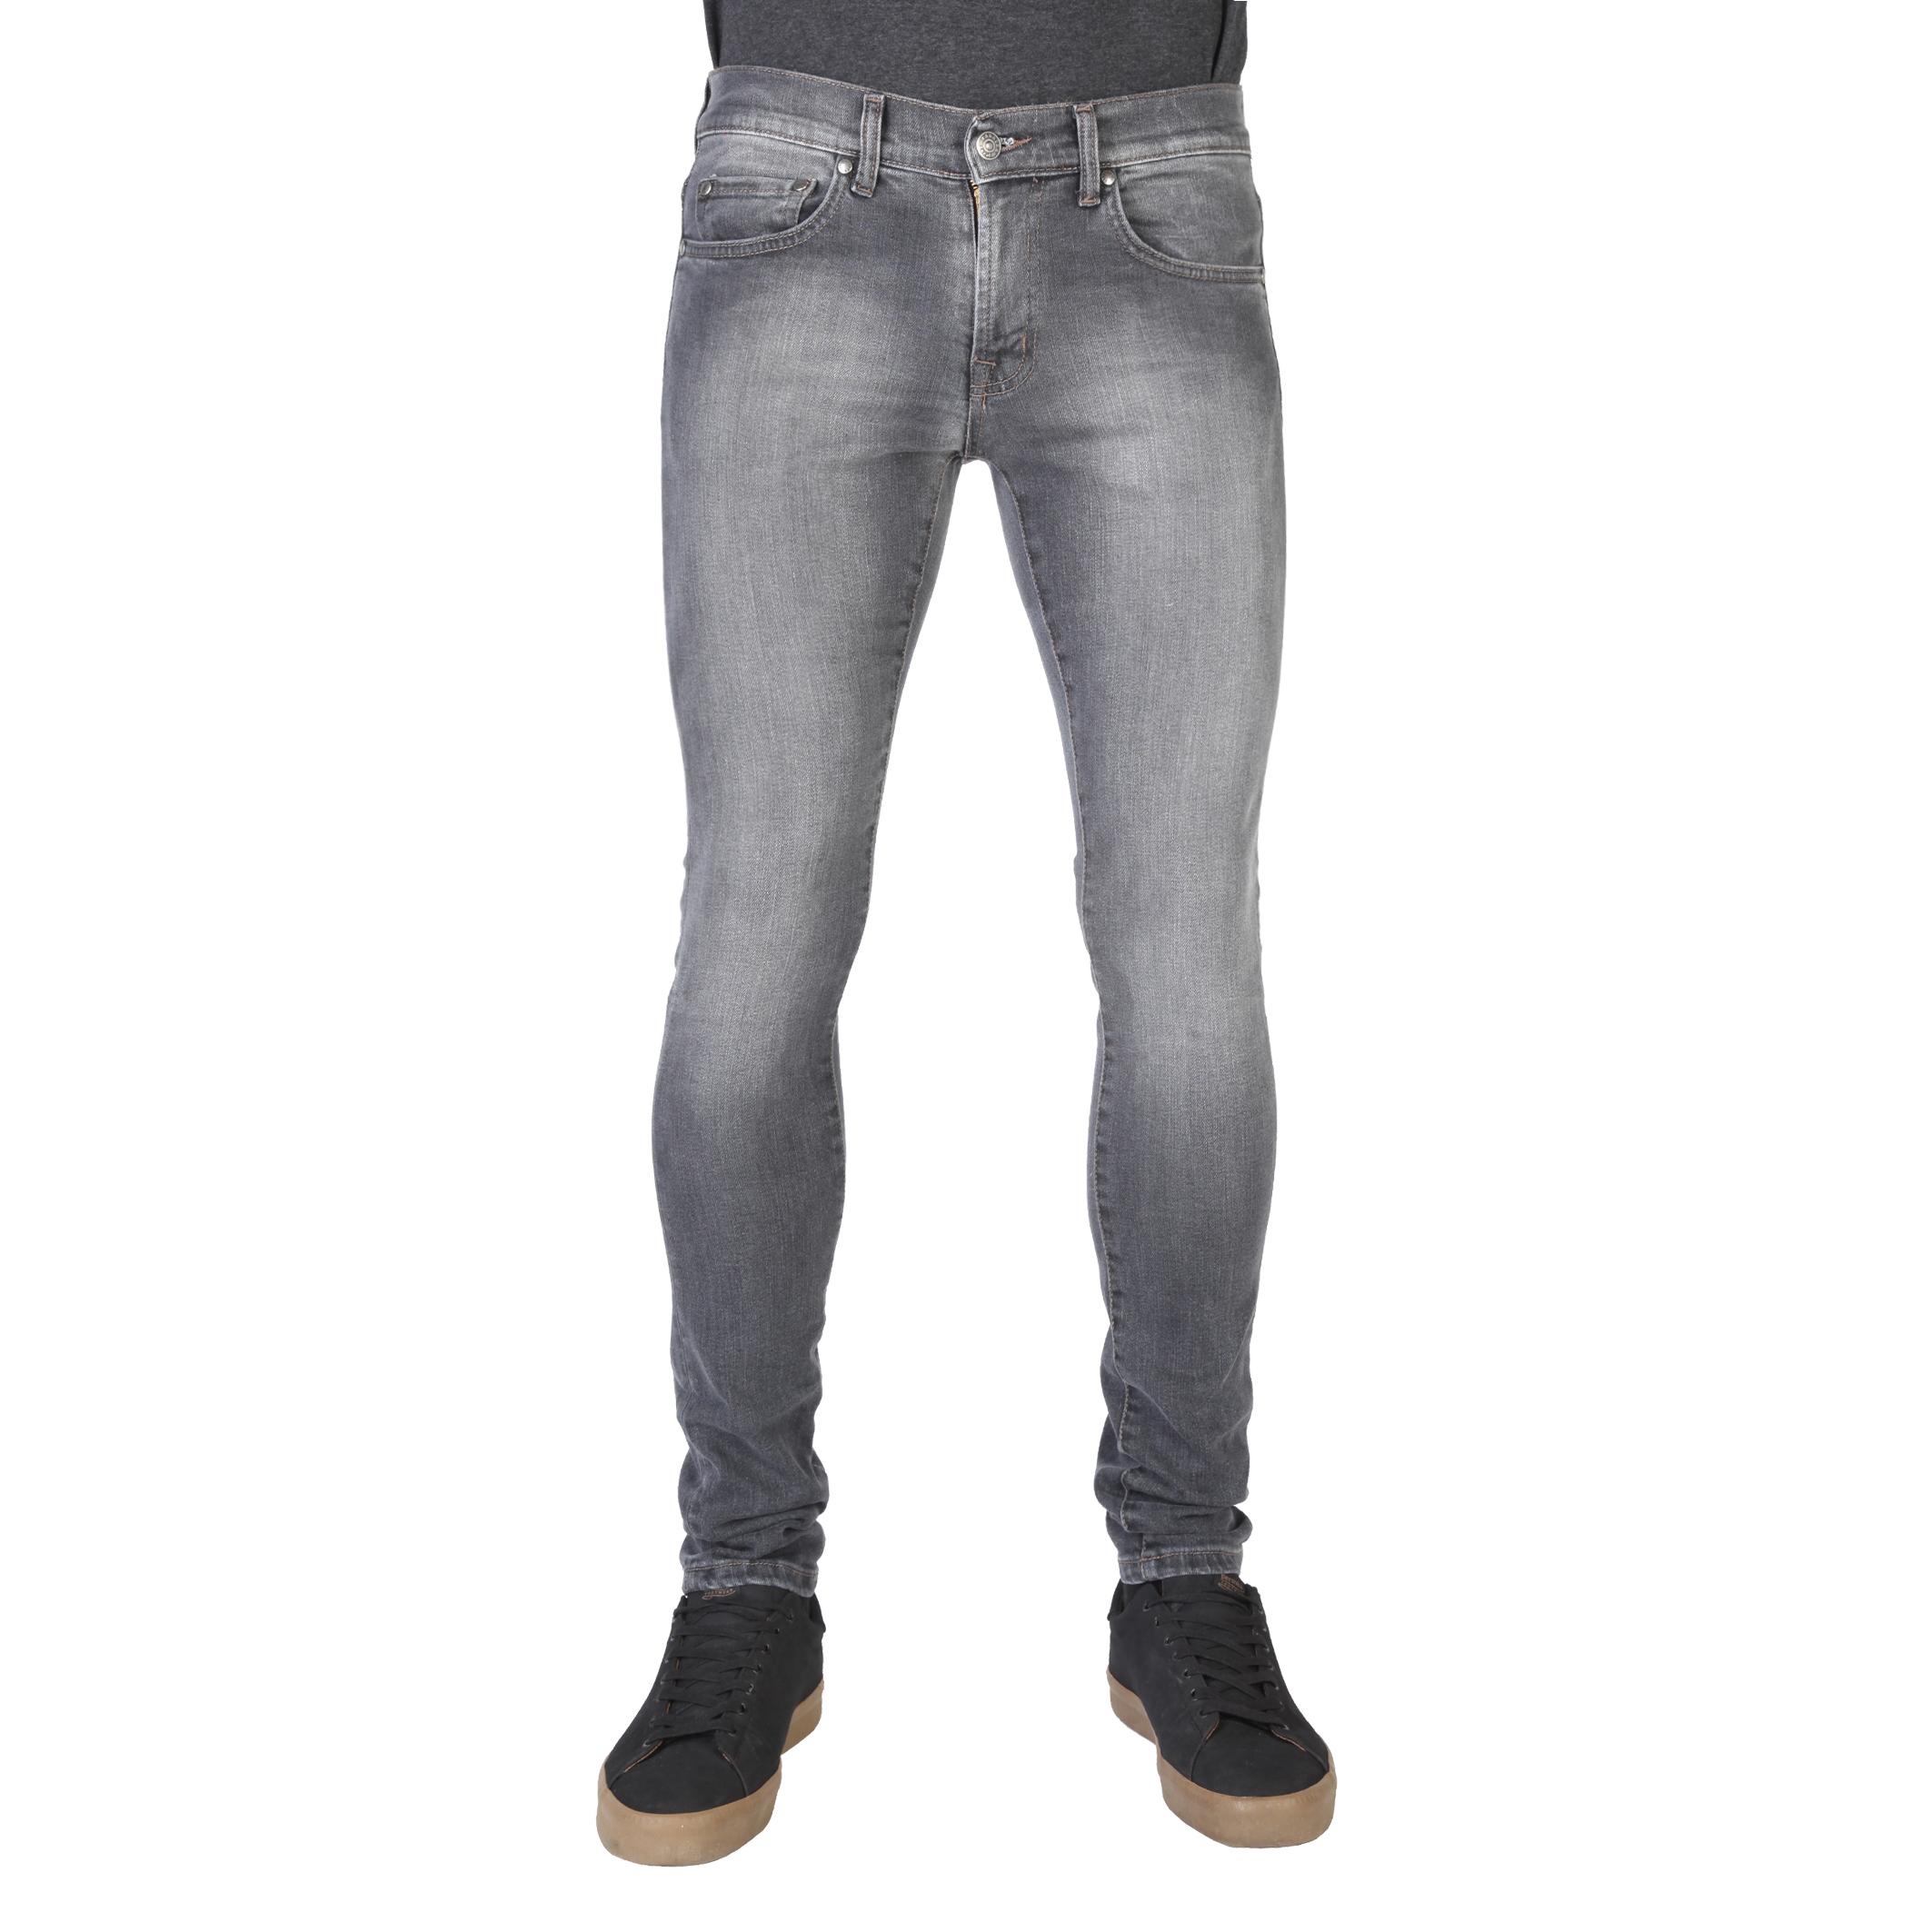 Jeans  Carrera Jeans 000737_0970X grey